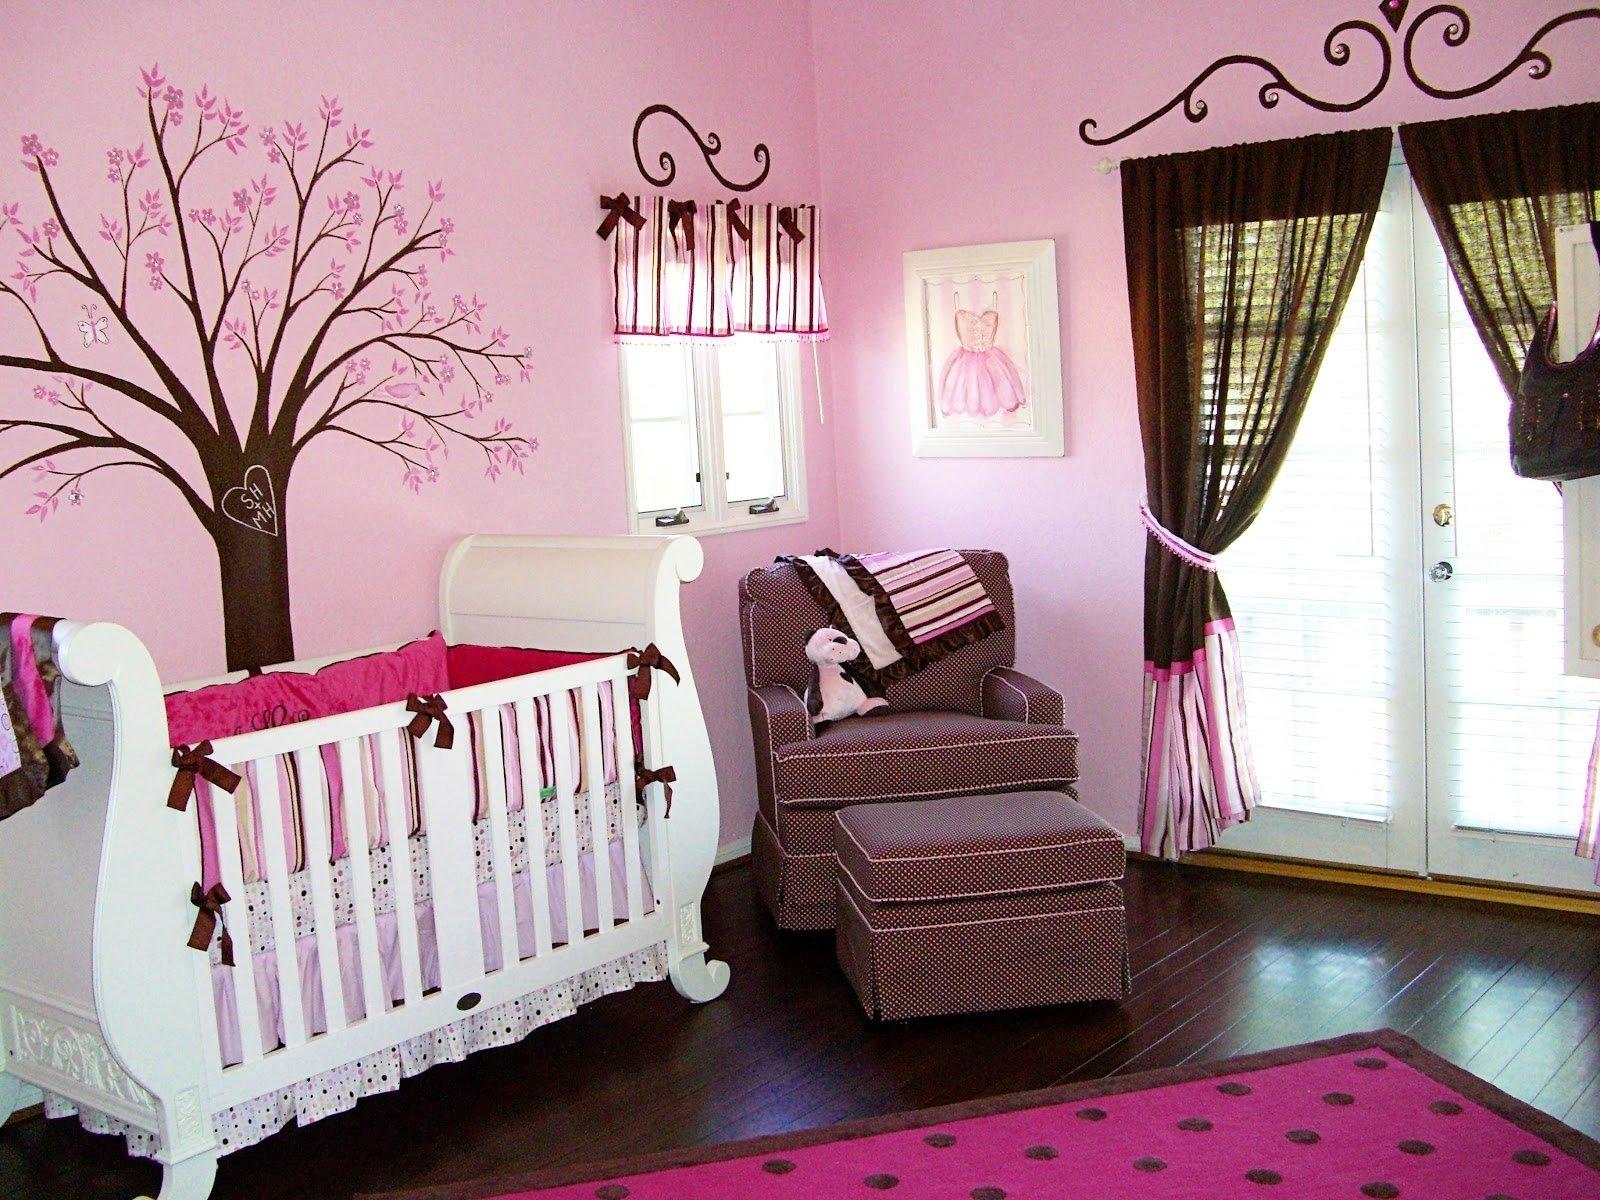 10 Wonderful Baby Girl Nursery Decorating Ideas baby nursery prettier baby girl forest nursery design baby girl 2020